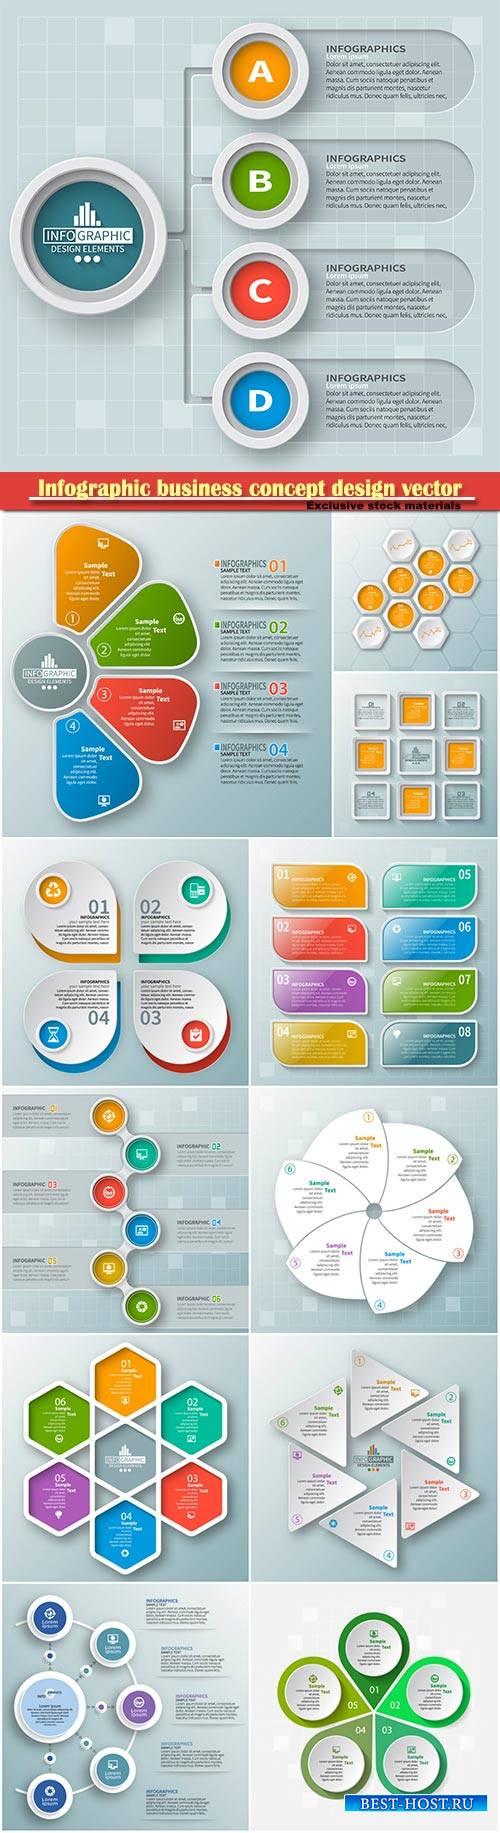 Infographic business concept design vector illustration # 6